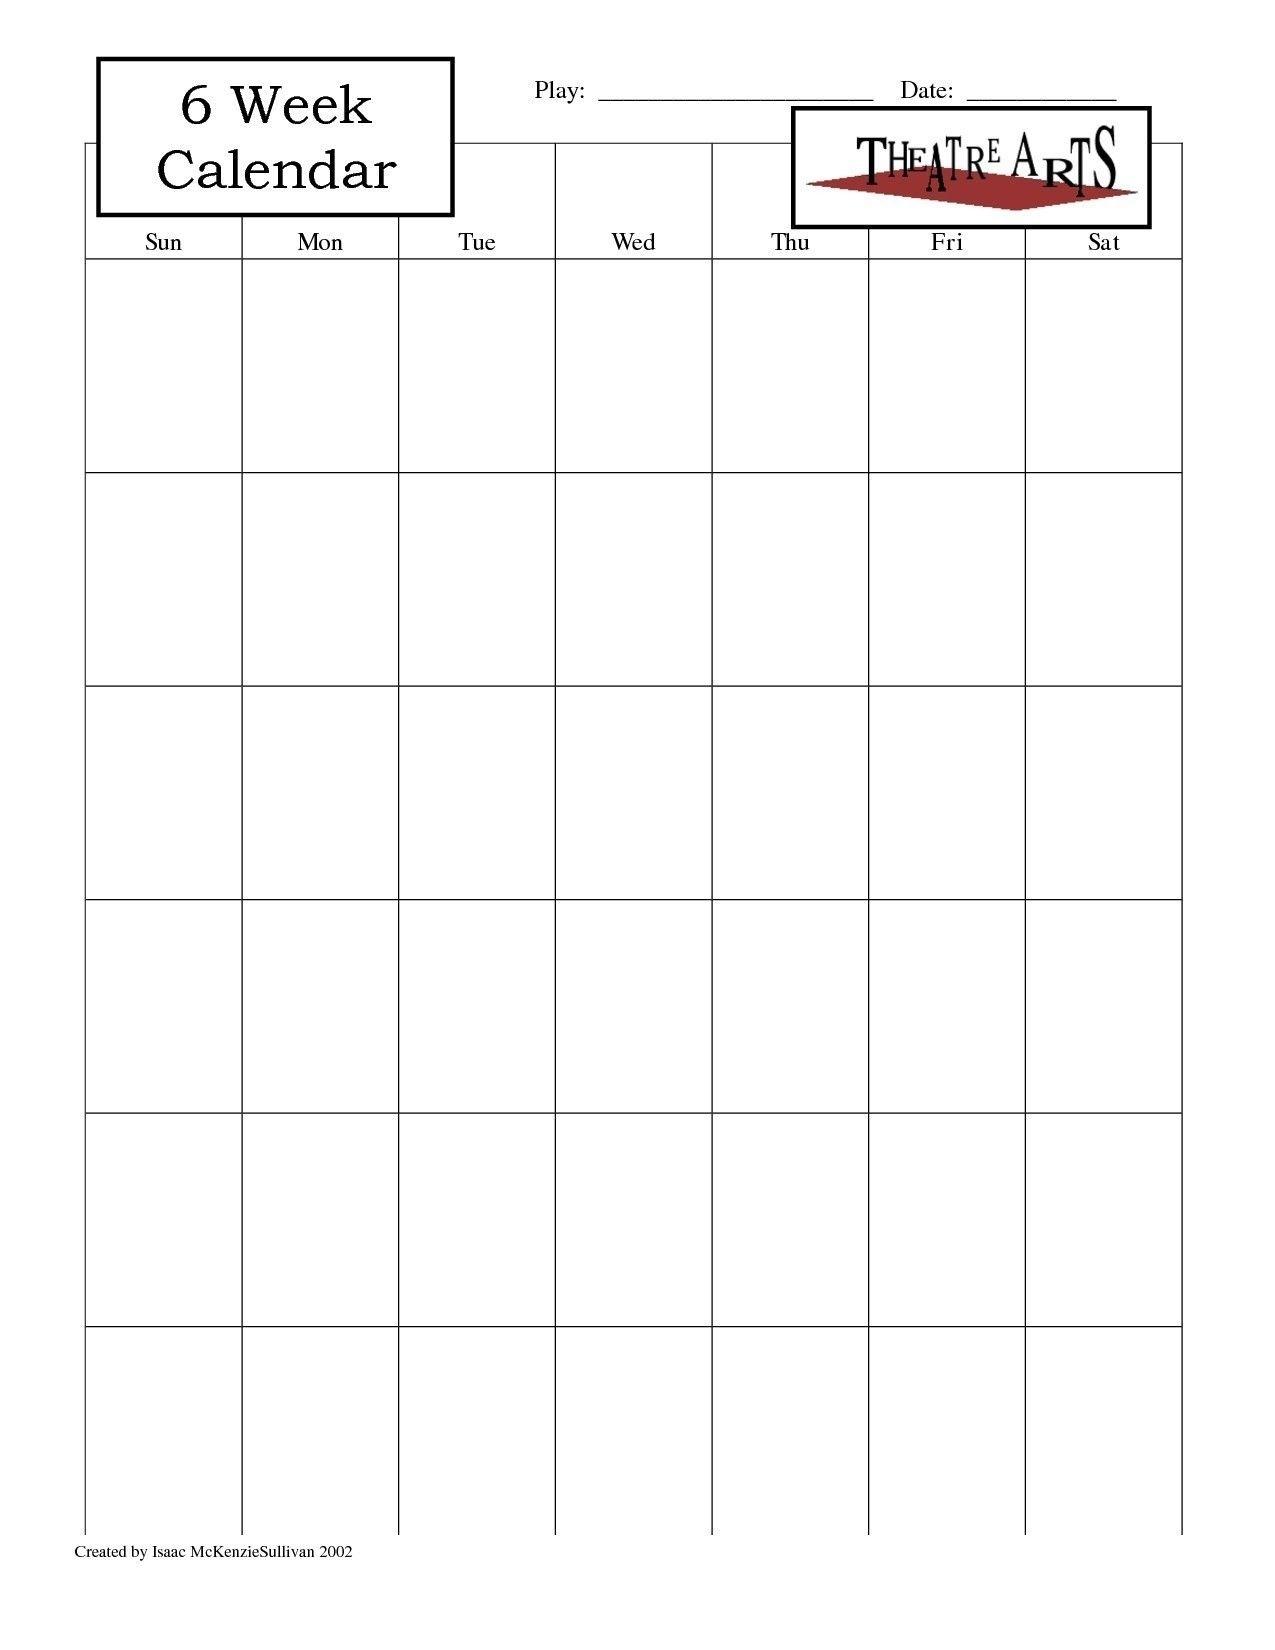 Blank 6 Week Calendar | Thekpark-Hadong Dowload | Blank